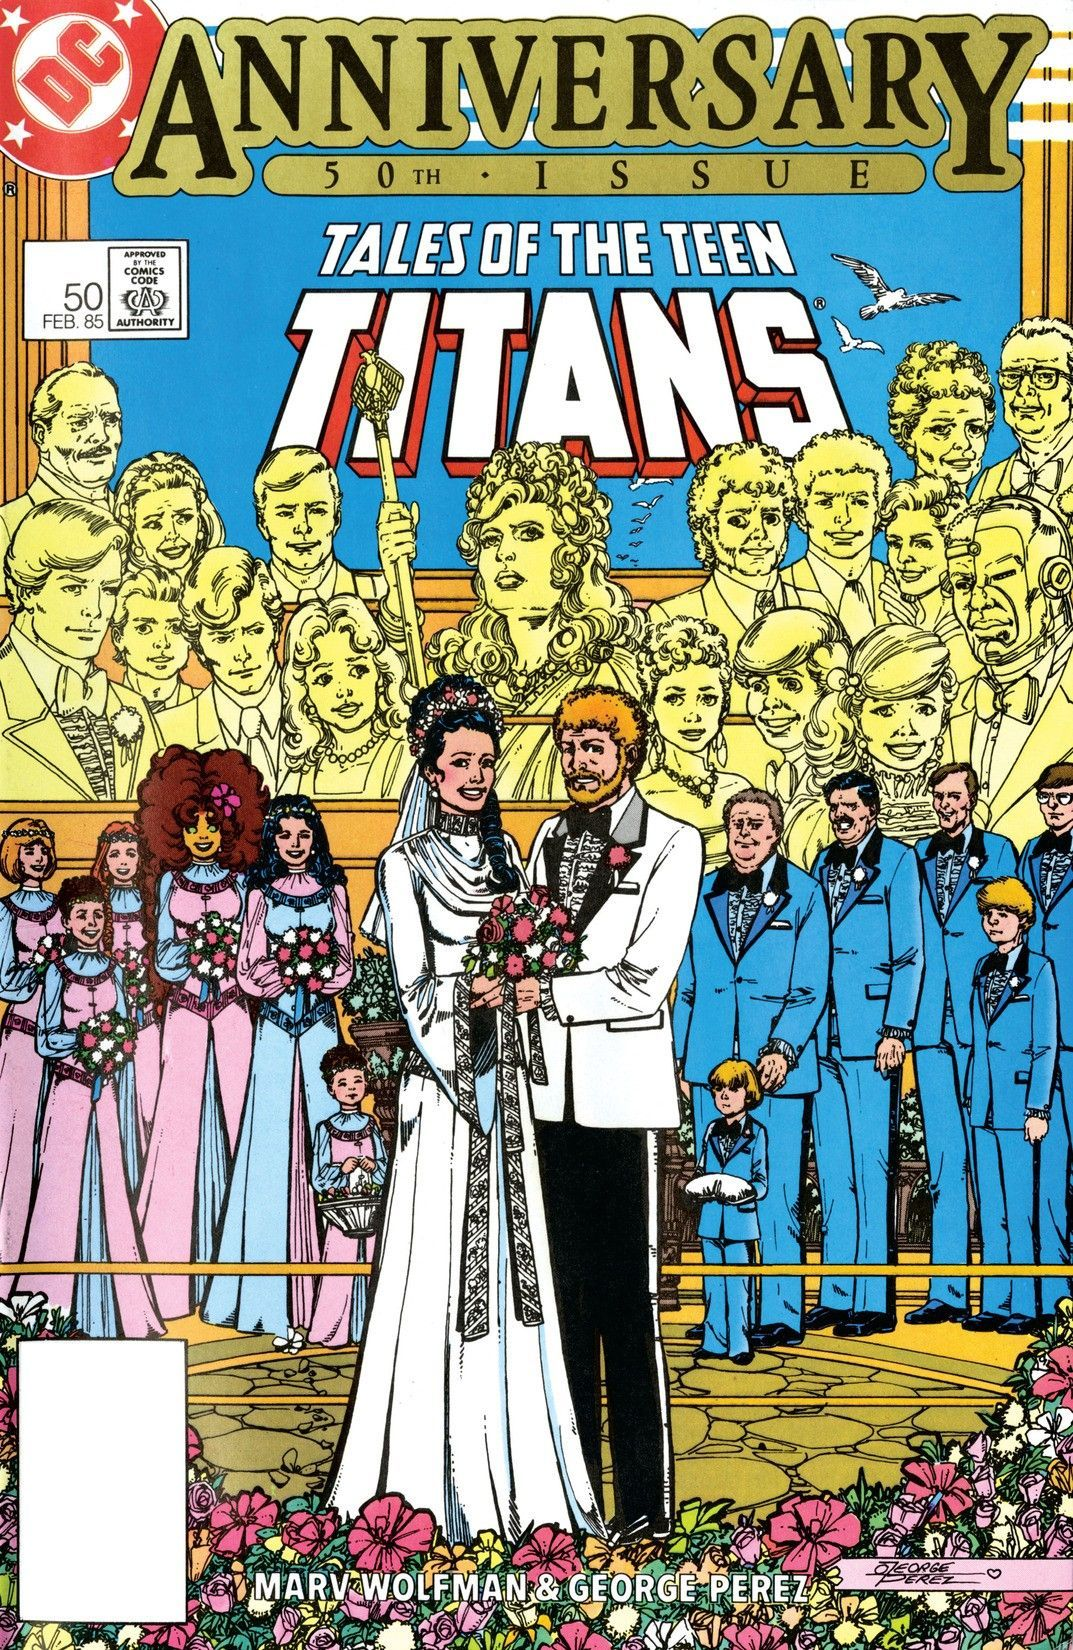 Pin on I do... Comic Book Weddings